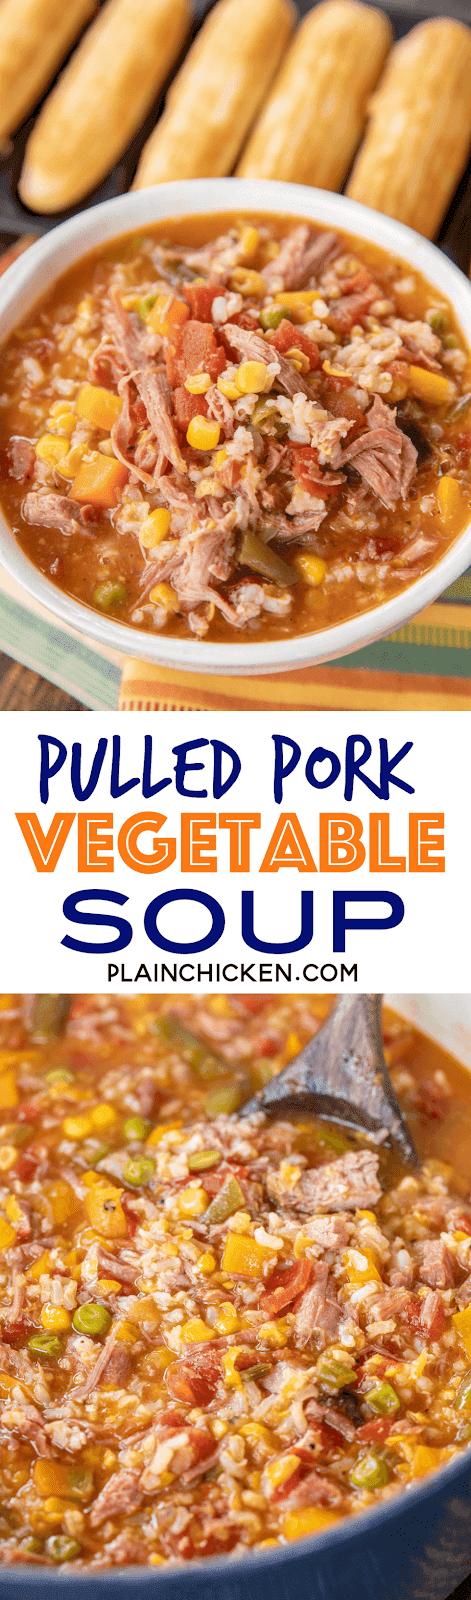 Pulled Pork Vegetable Soup Plain Chicken 174